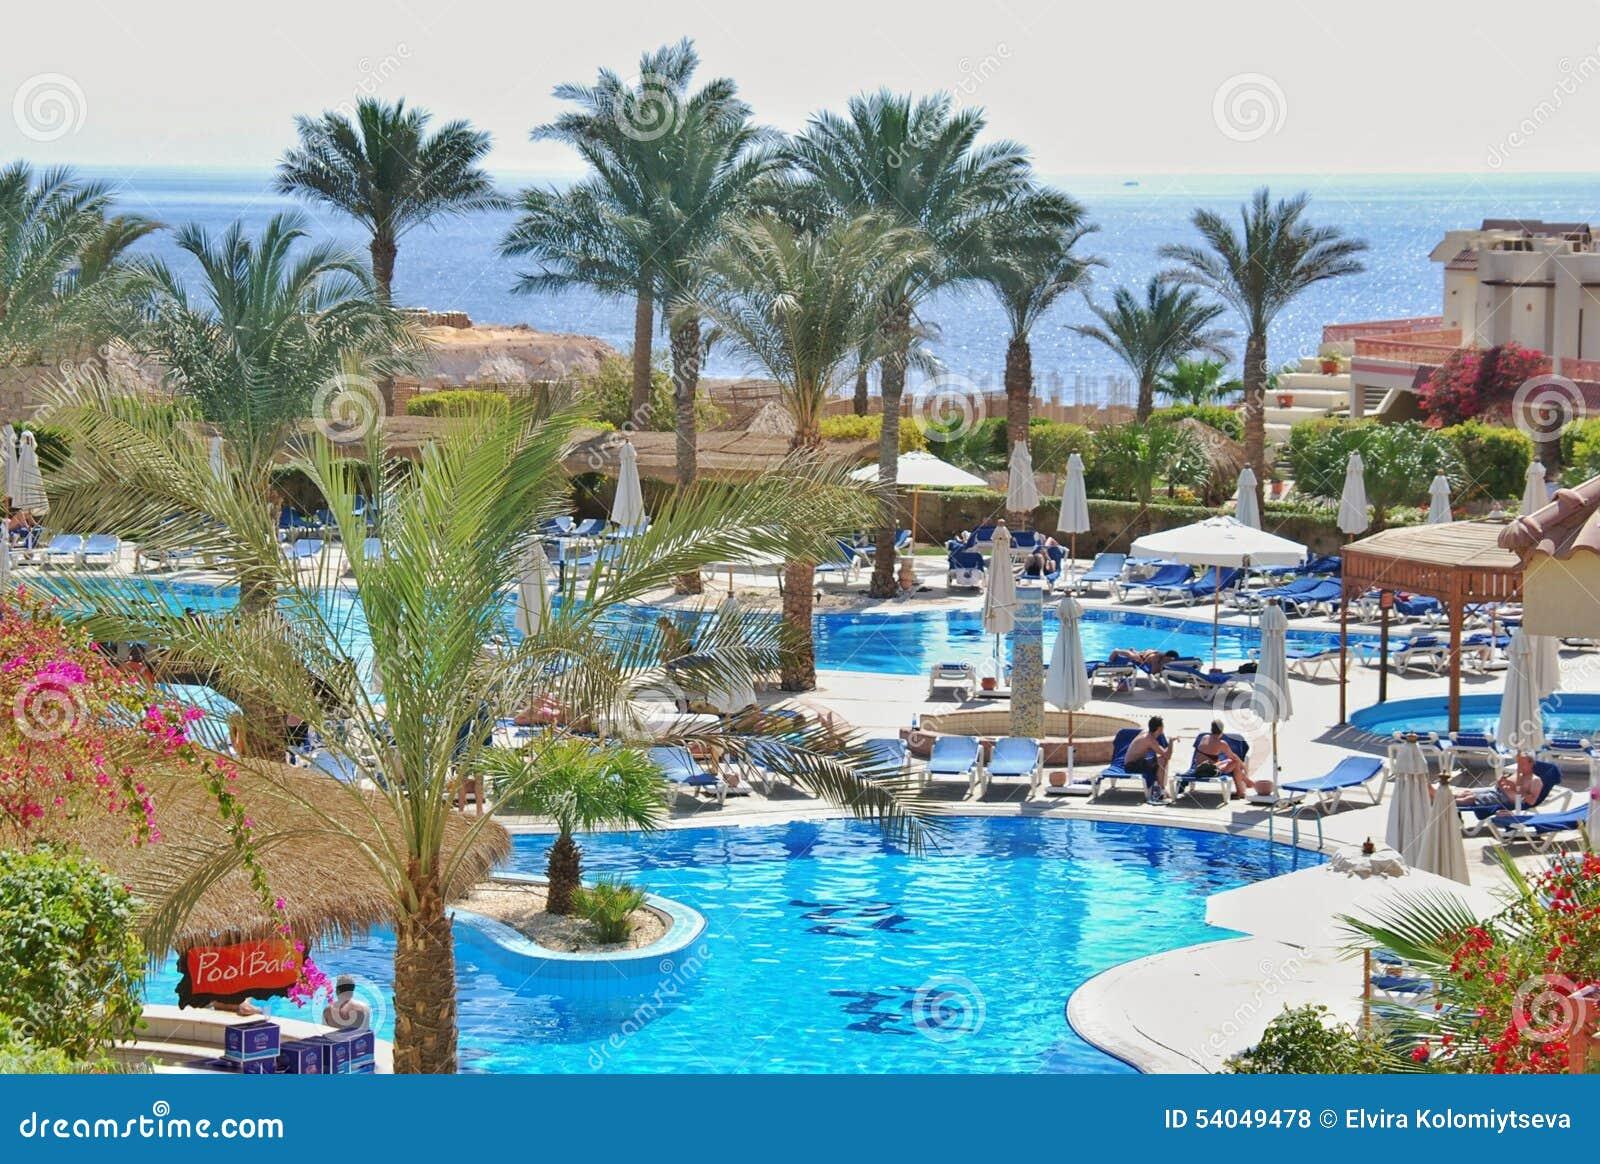 Swimming Pool Of Hilton Sharks Bay Hotel Stock Photo Image Of